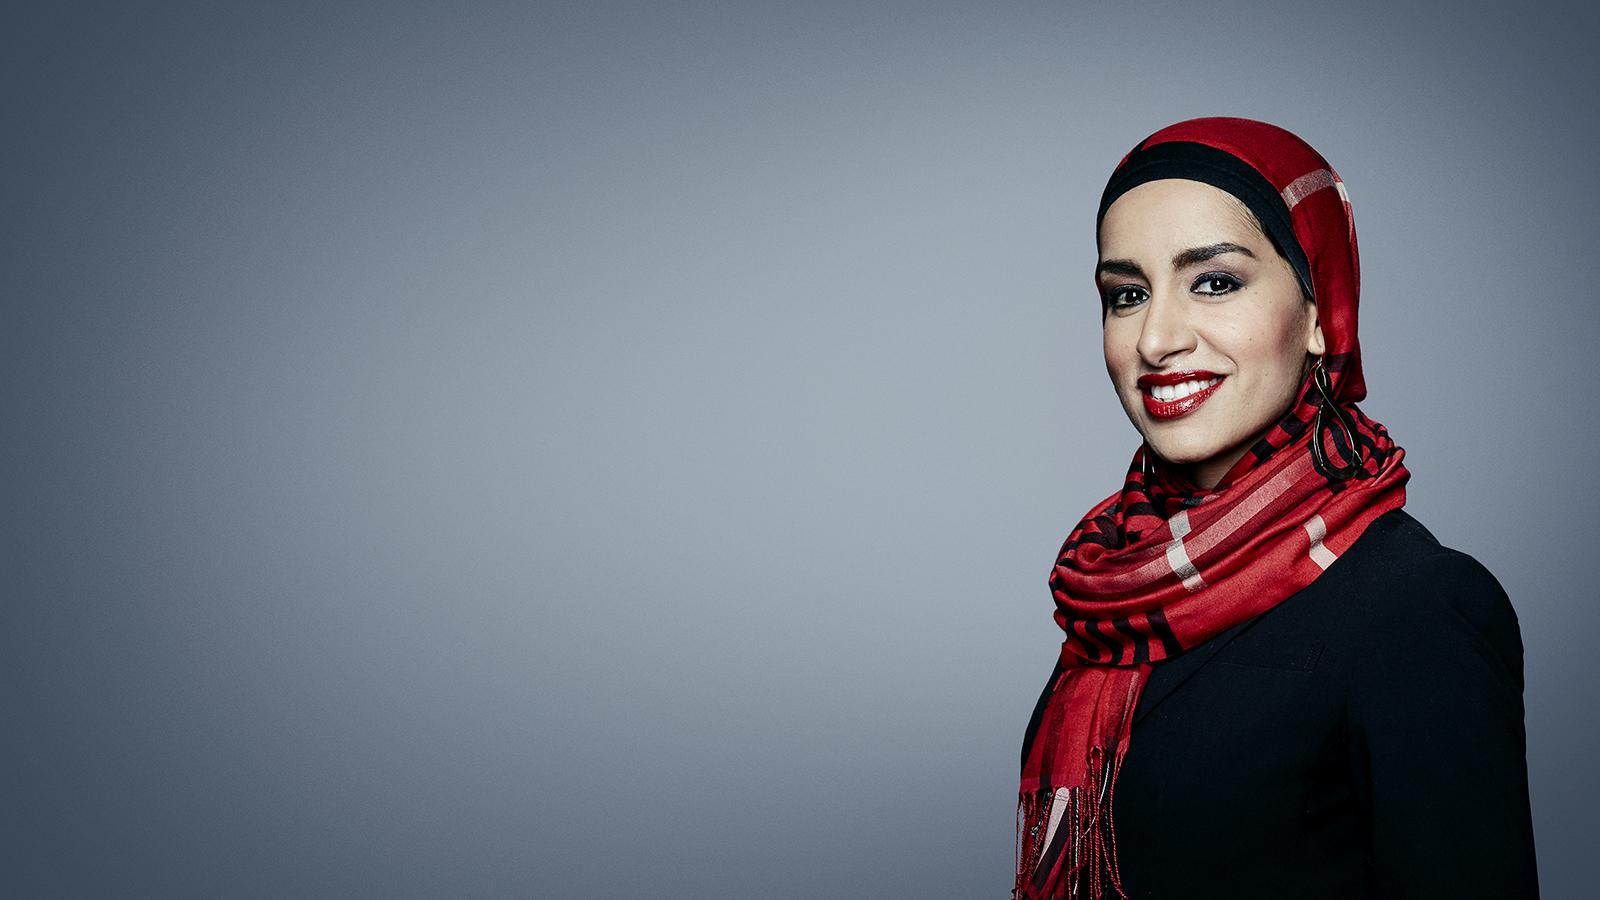 hinata-arabian-girl-nudes-with-scarfs-on-heads-hairy-teen